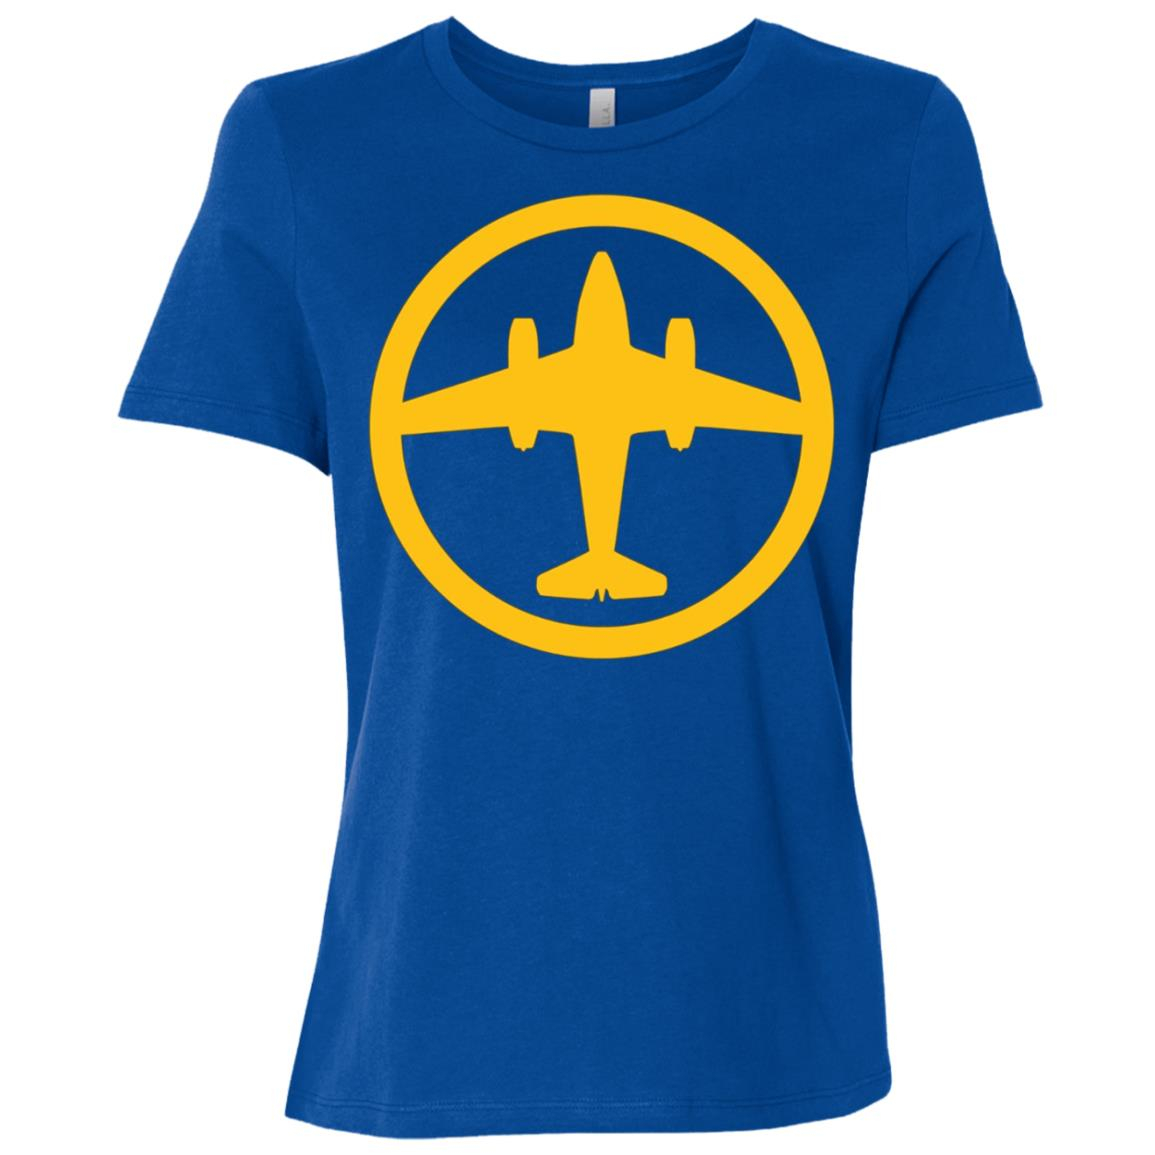 Me 262 Schwalbe (Yellow) World War II Airplane Women Short Sleeve T-Shirt